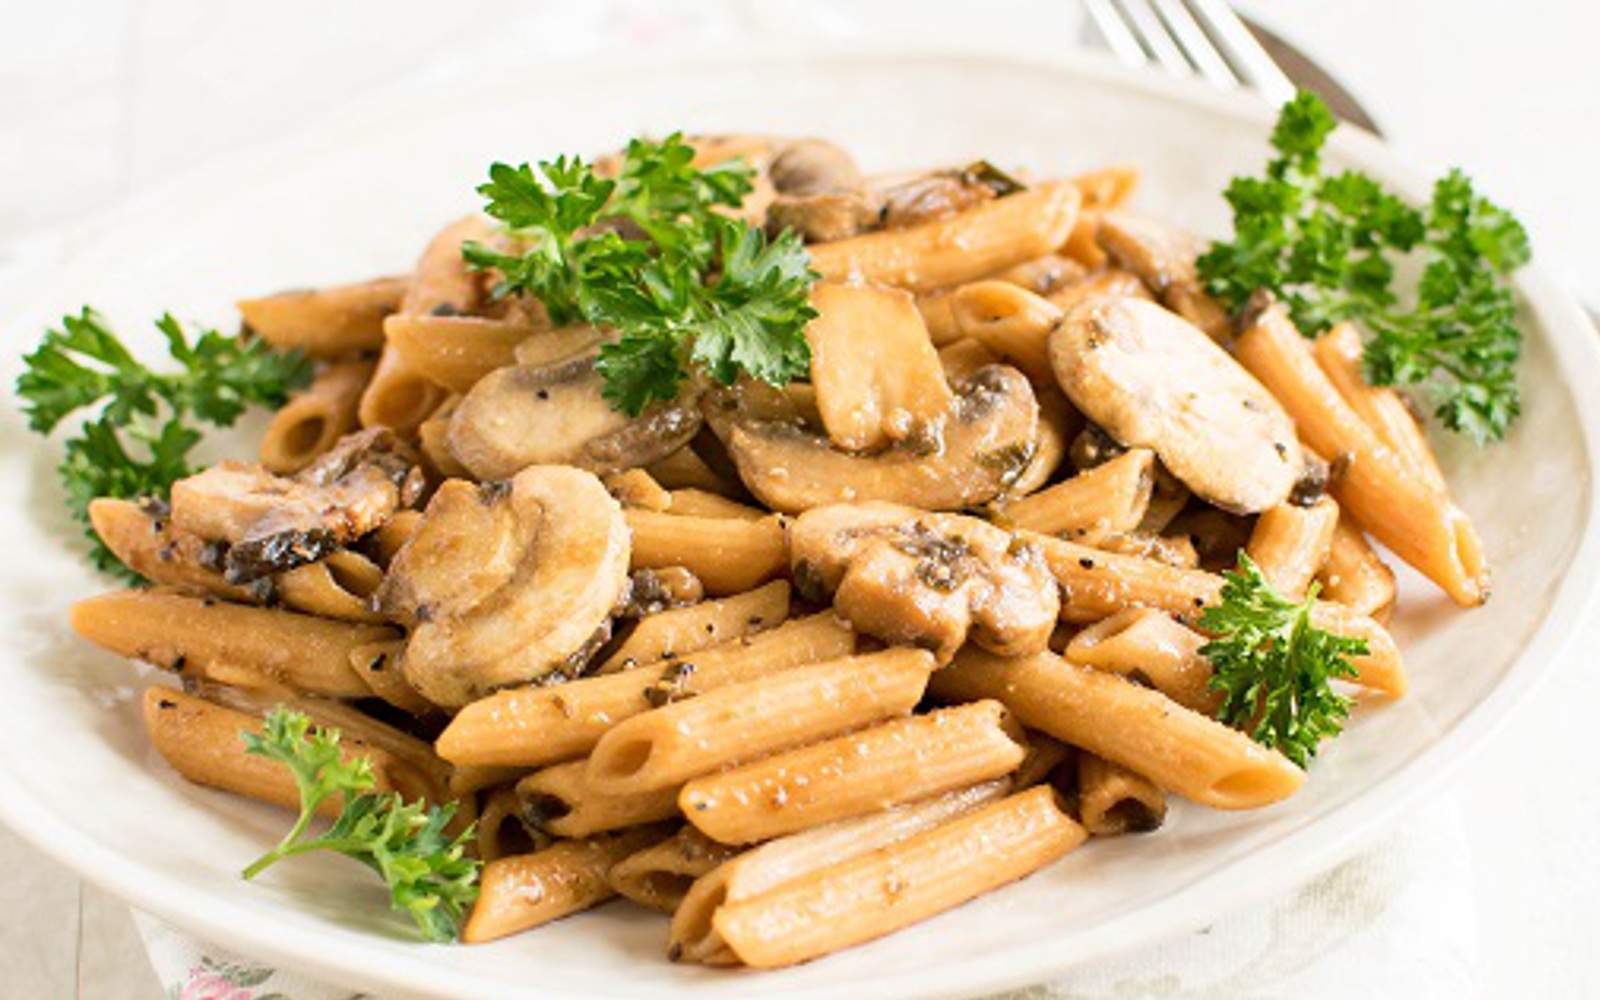 Pasta Mushroom Stir Fry3